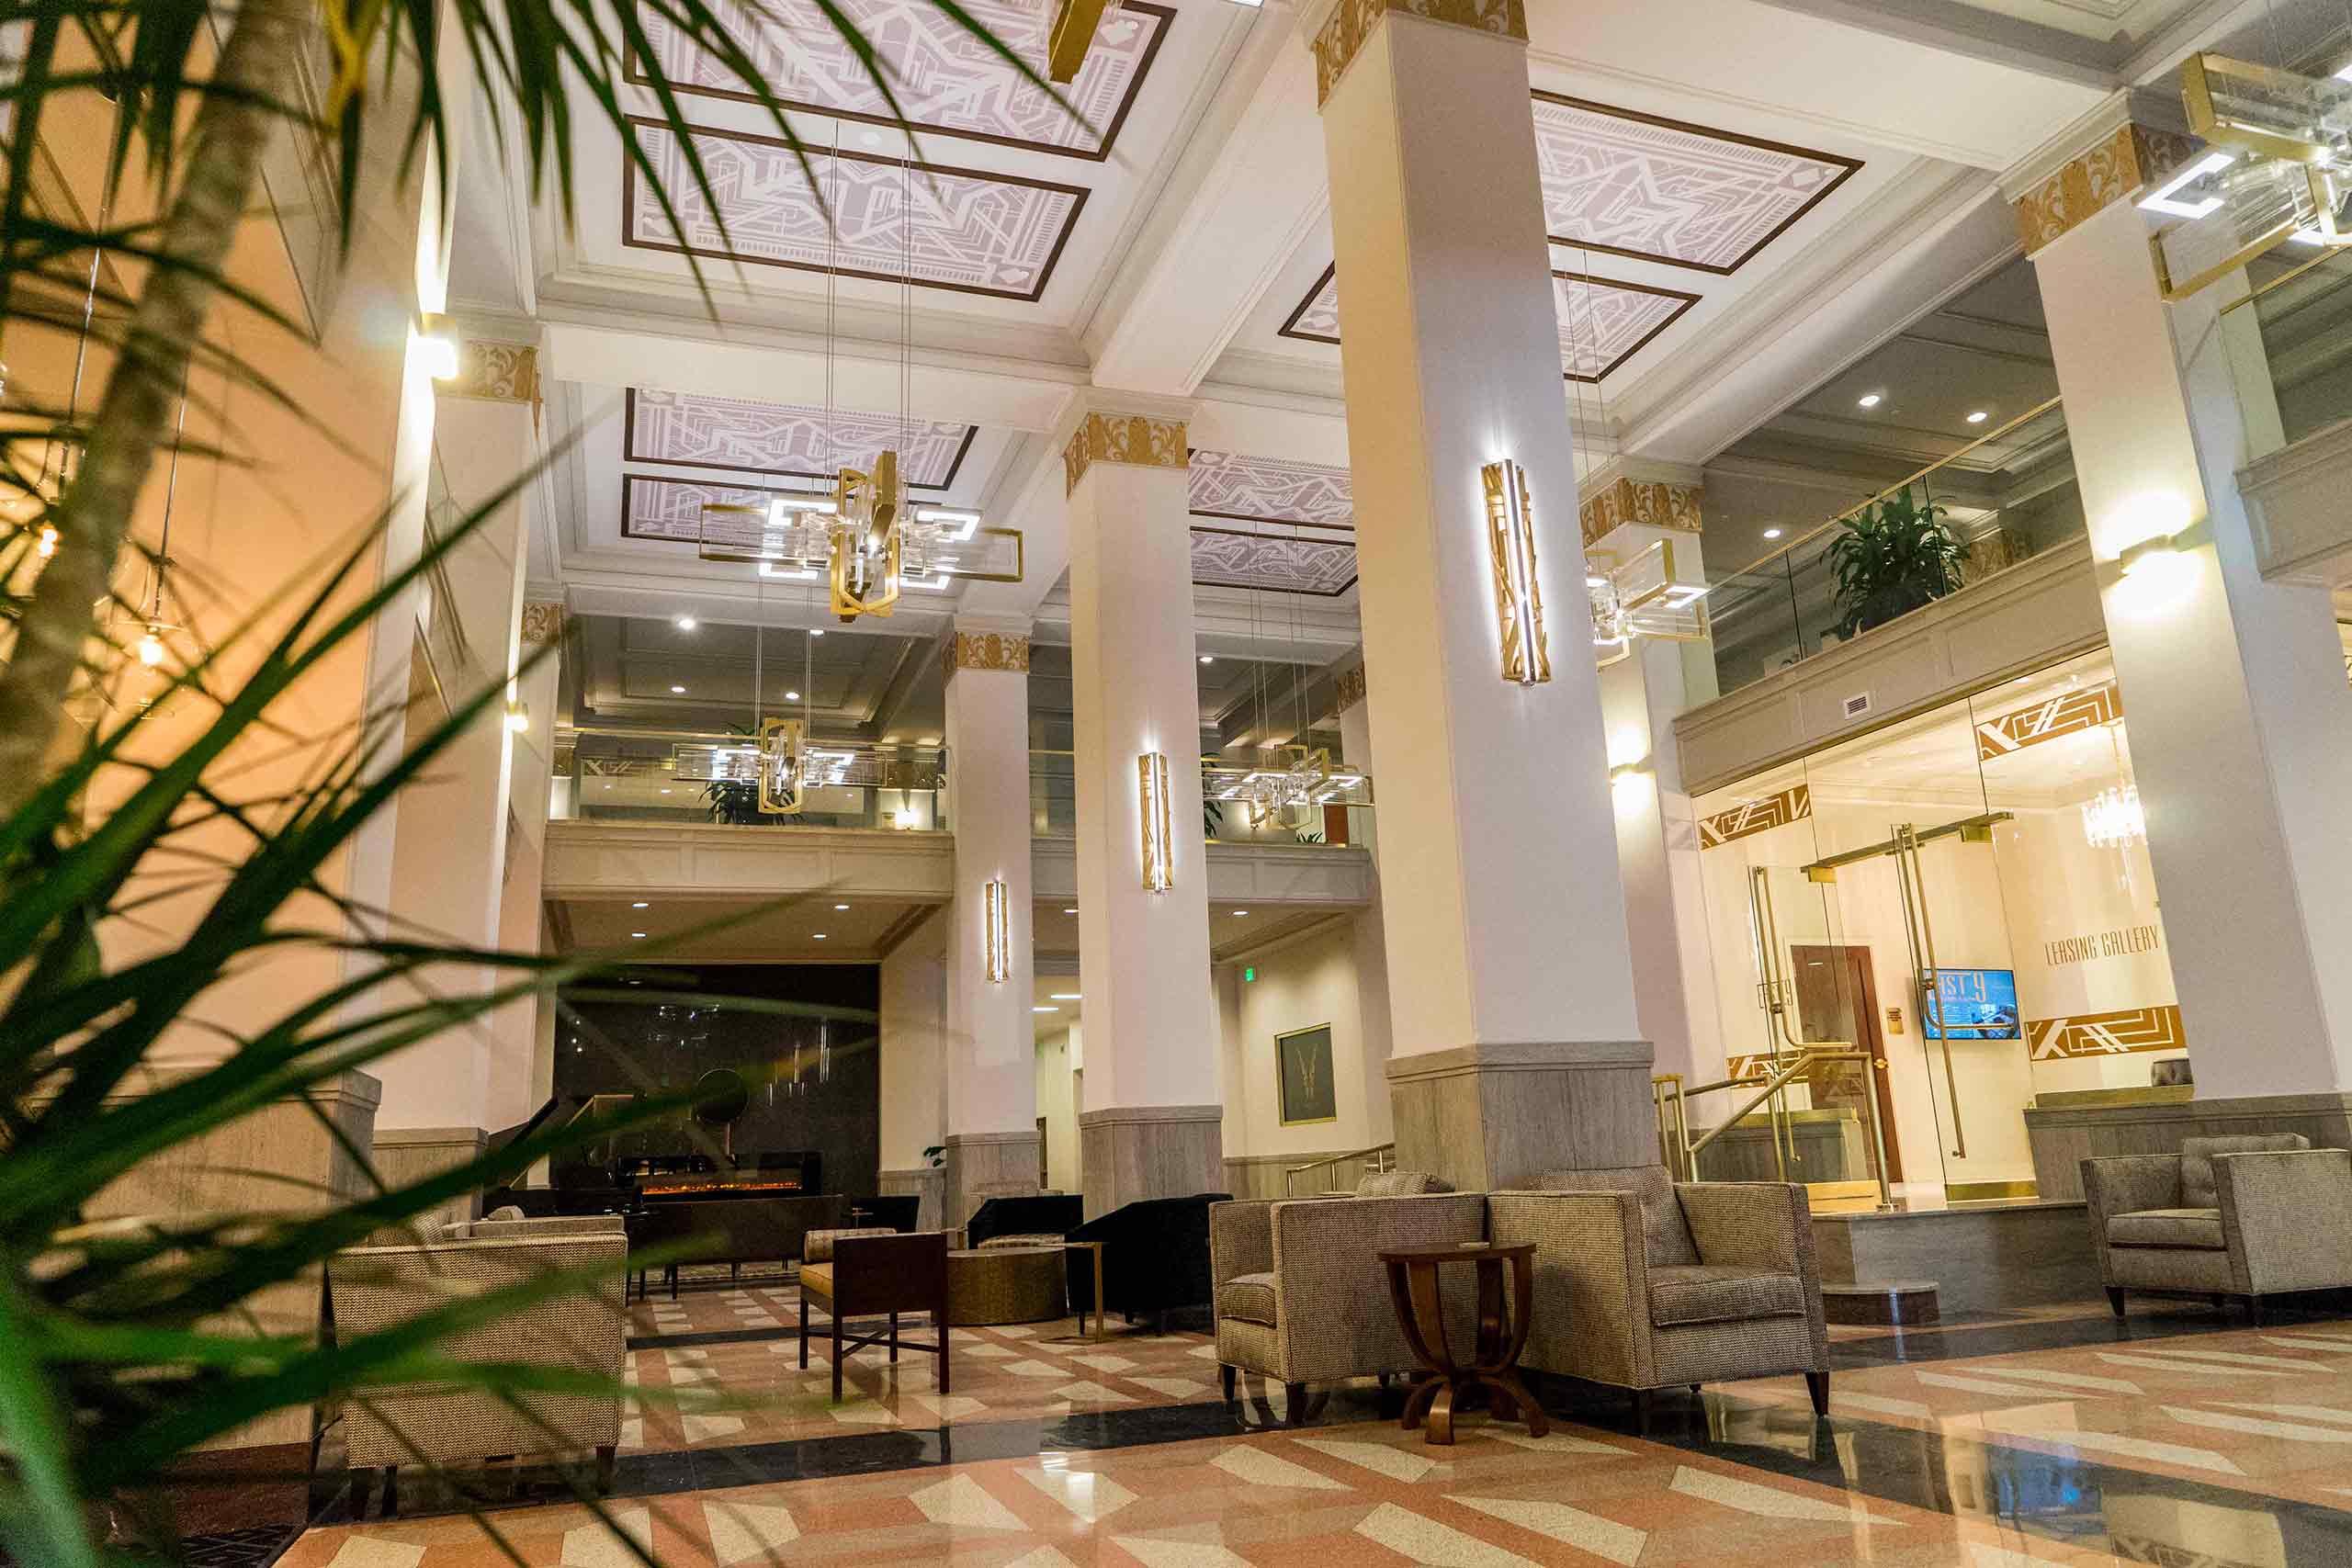 East-9-at-Pickwick-Plaza-Main-Lobby